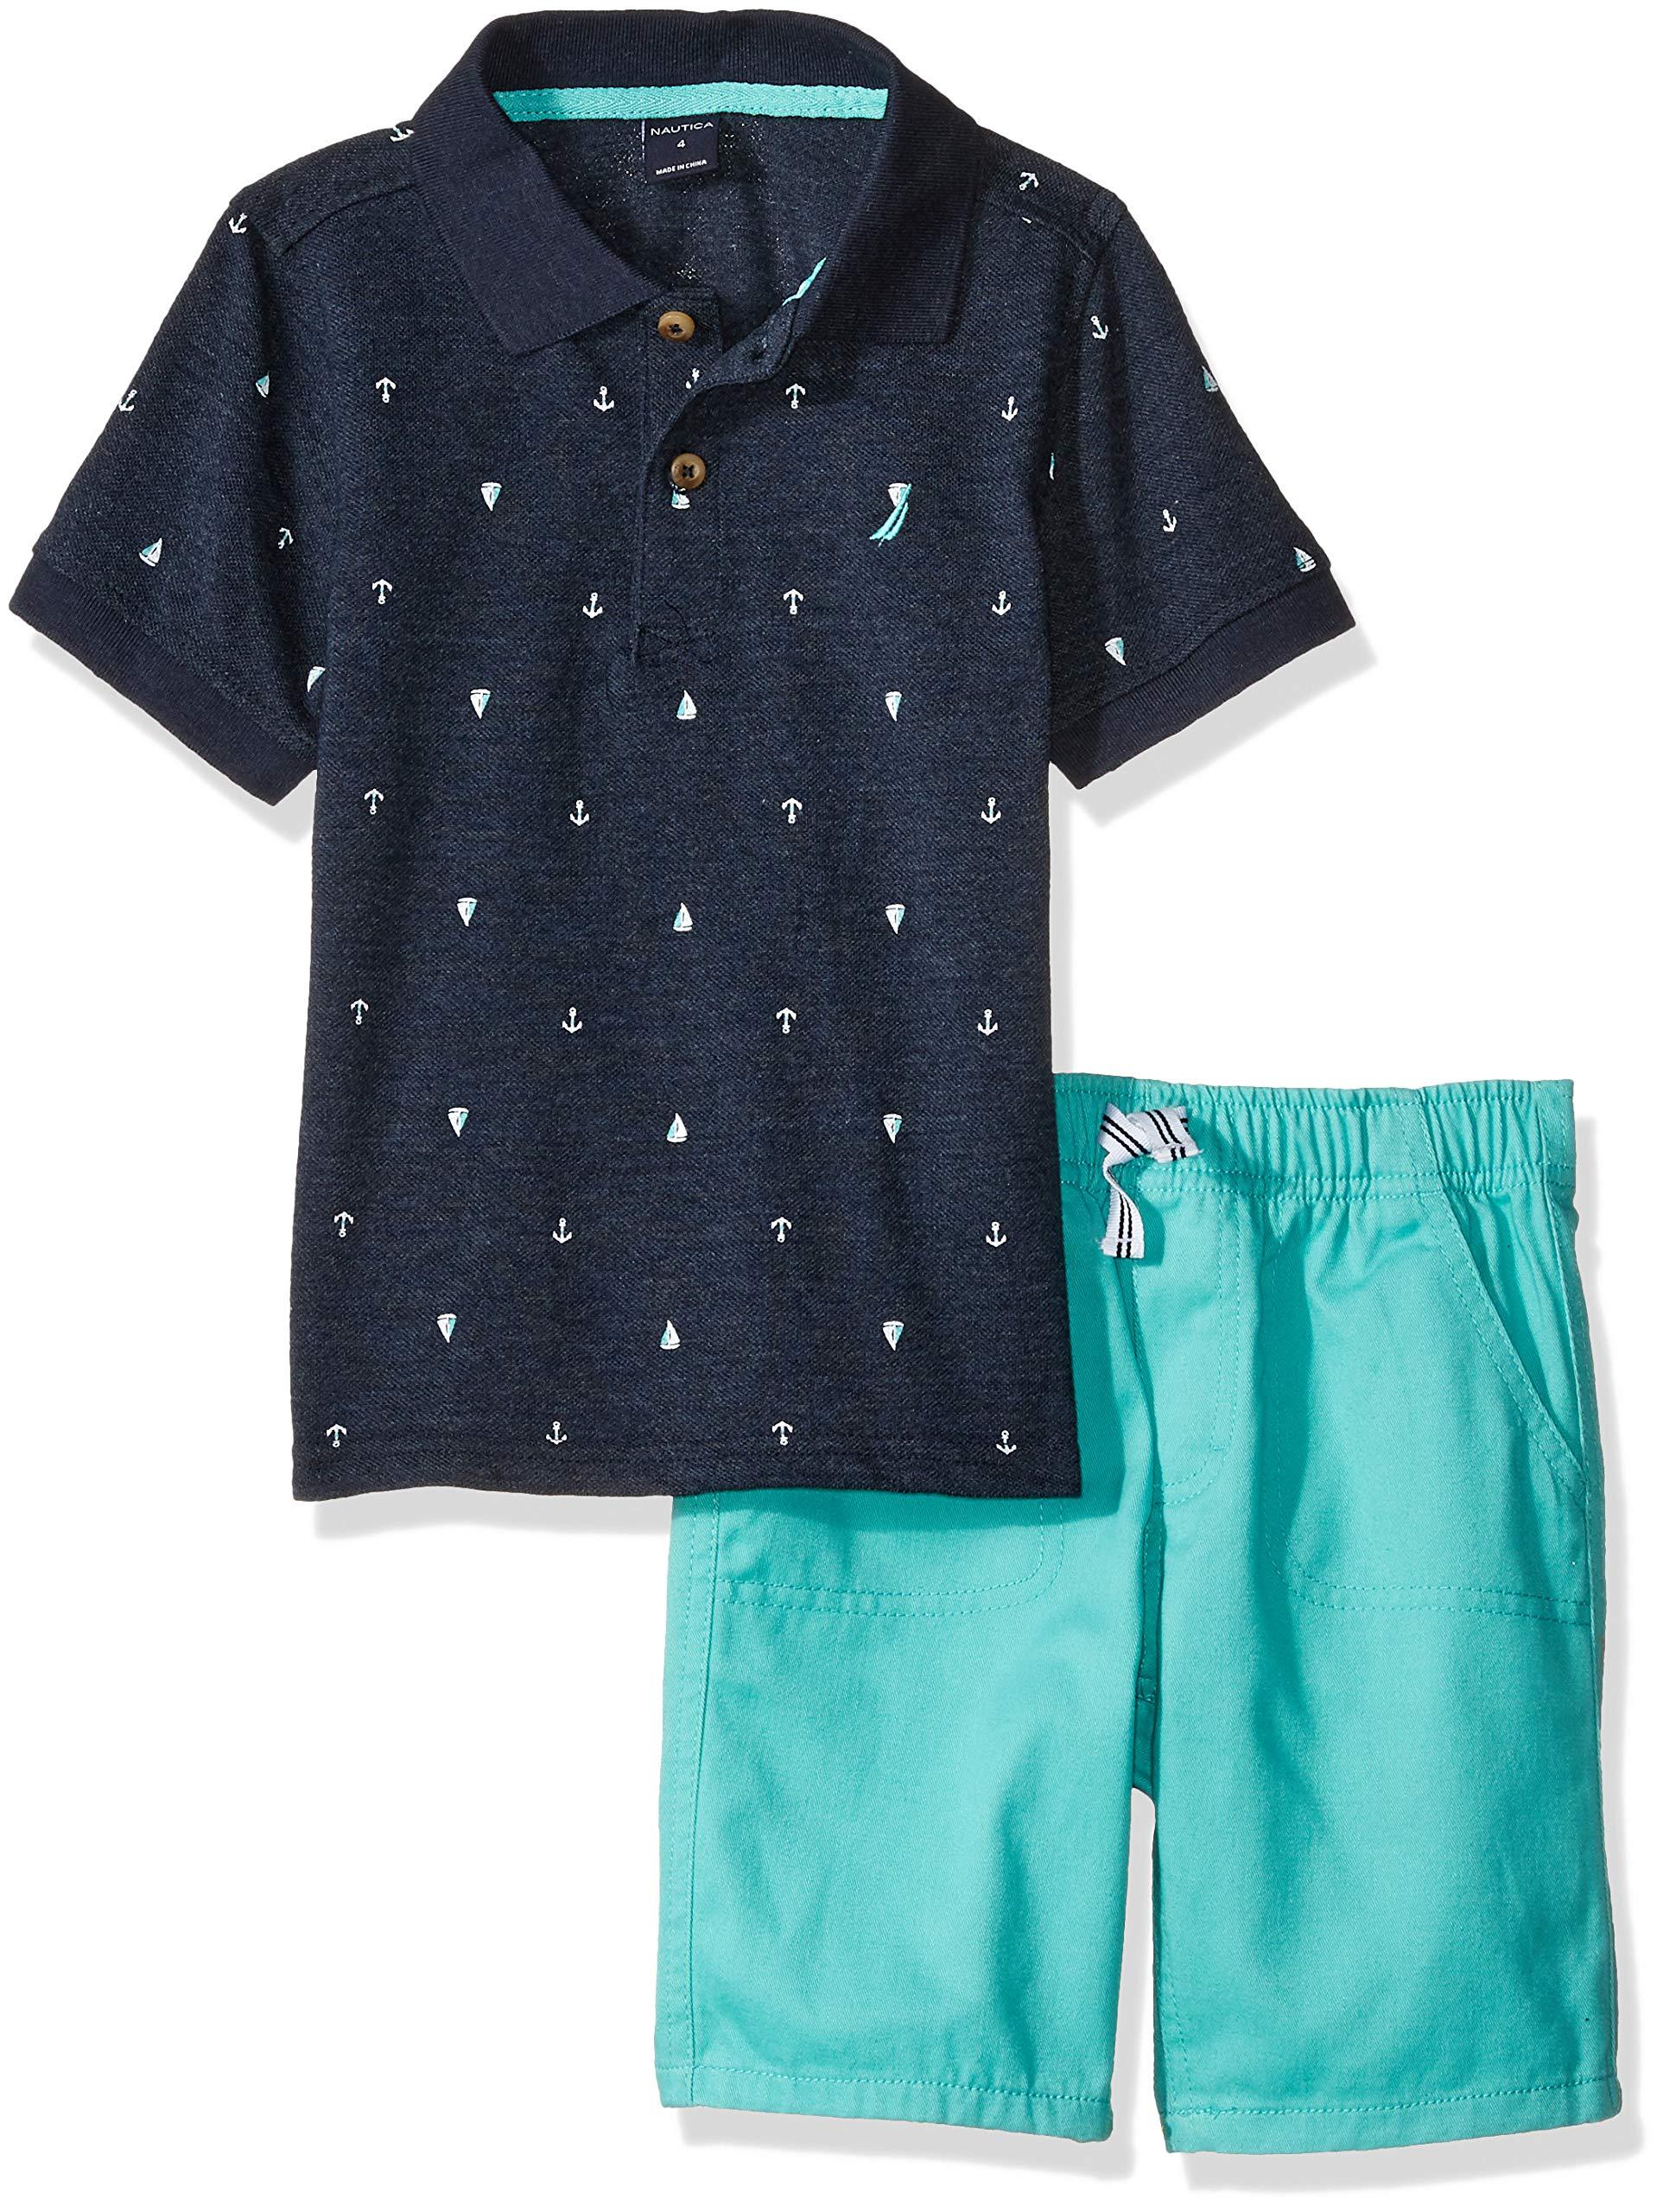 Nautica Sets (KHQ) Boys' Toddler 2 Pieces Polo Shorts Set, Blue/Green 3T